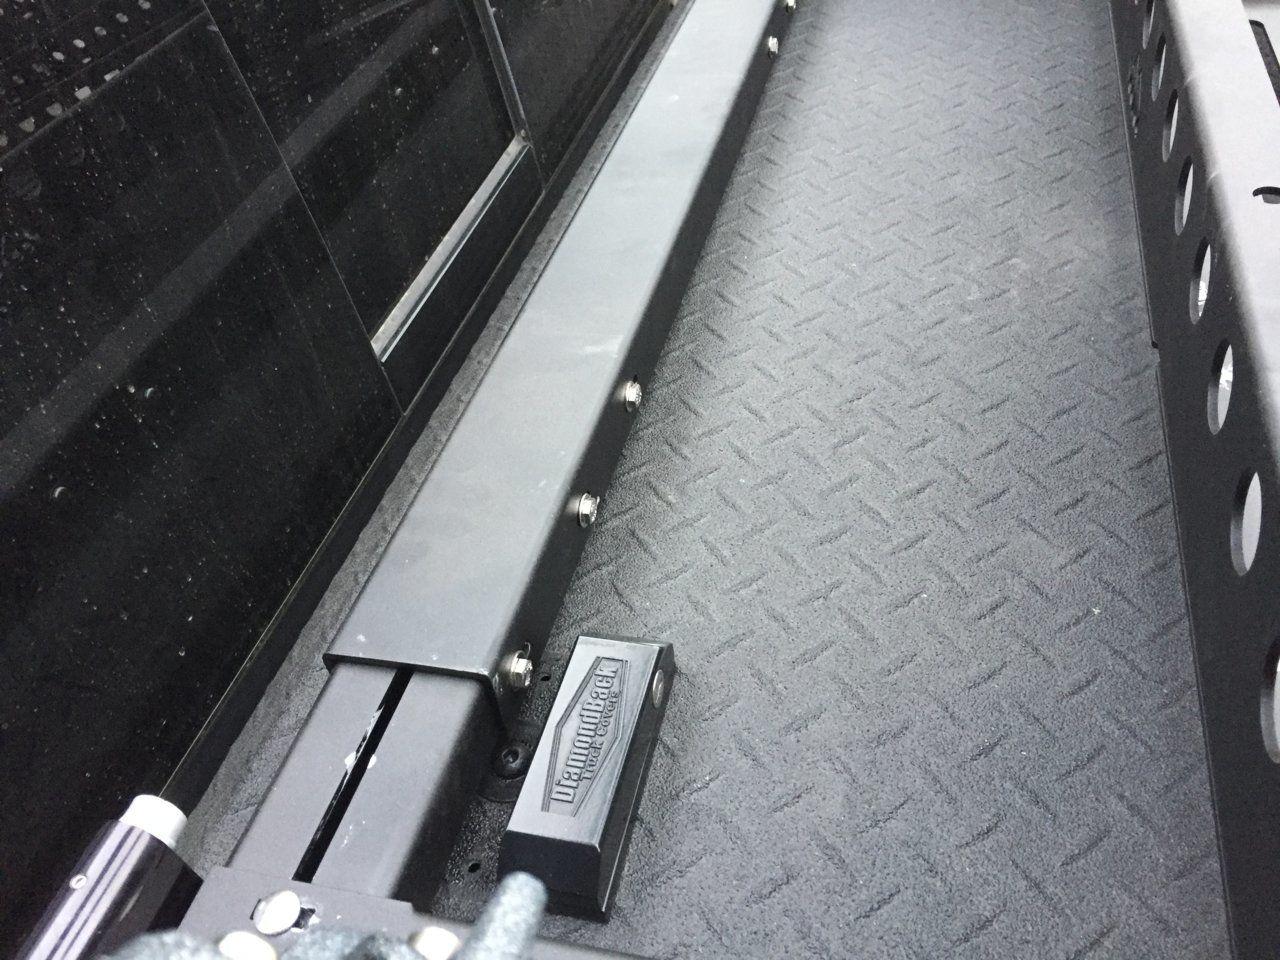 KB Voodoo AluMax Rack Install with Diamondback Cover